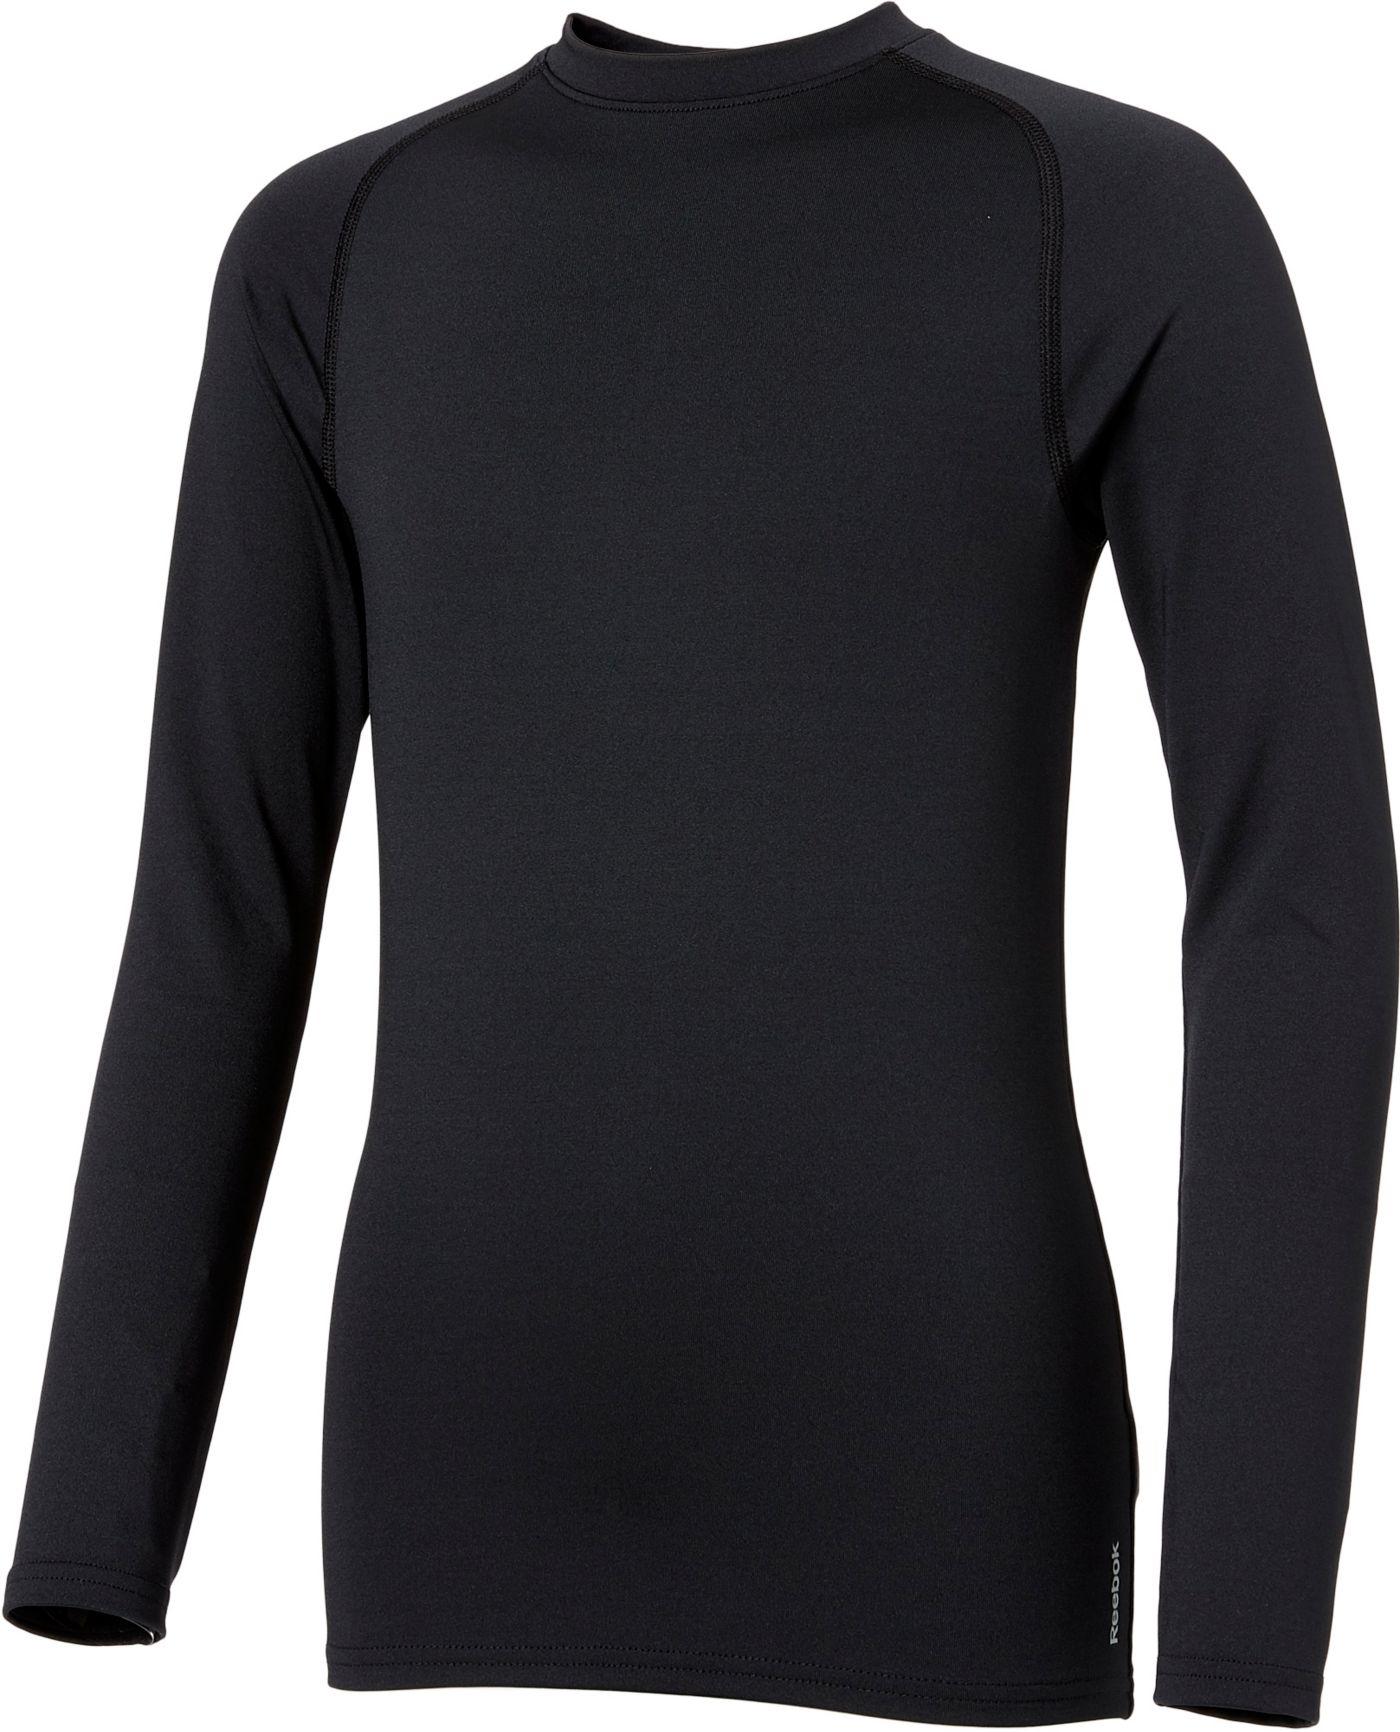 Reebok Boys' Cold Weather Compression Crewneck Long Sleeve Shirt